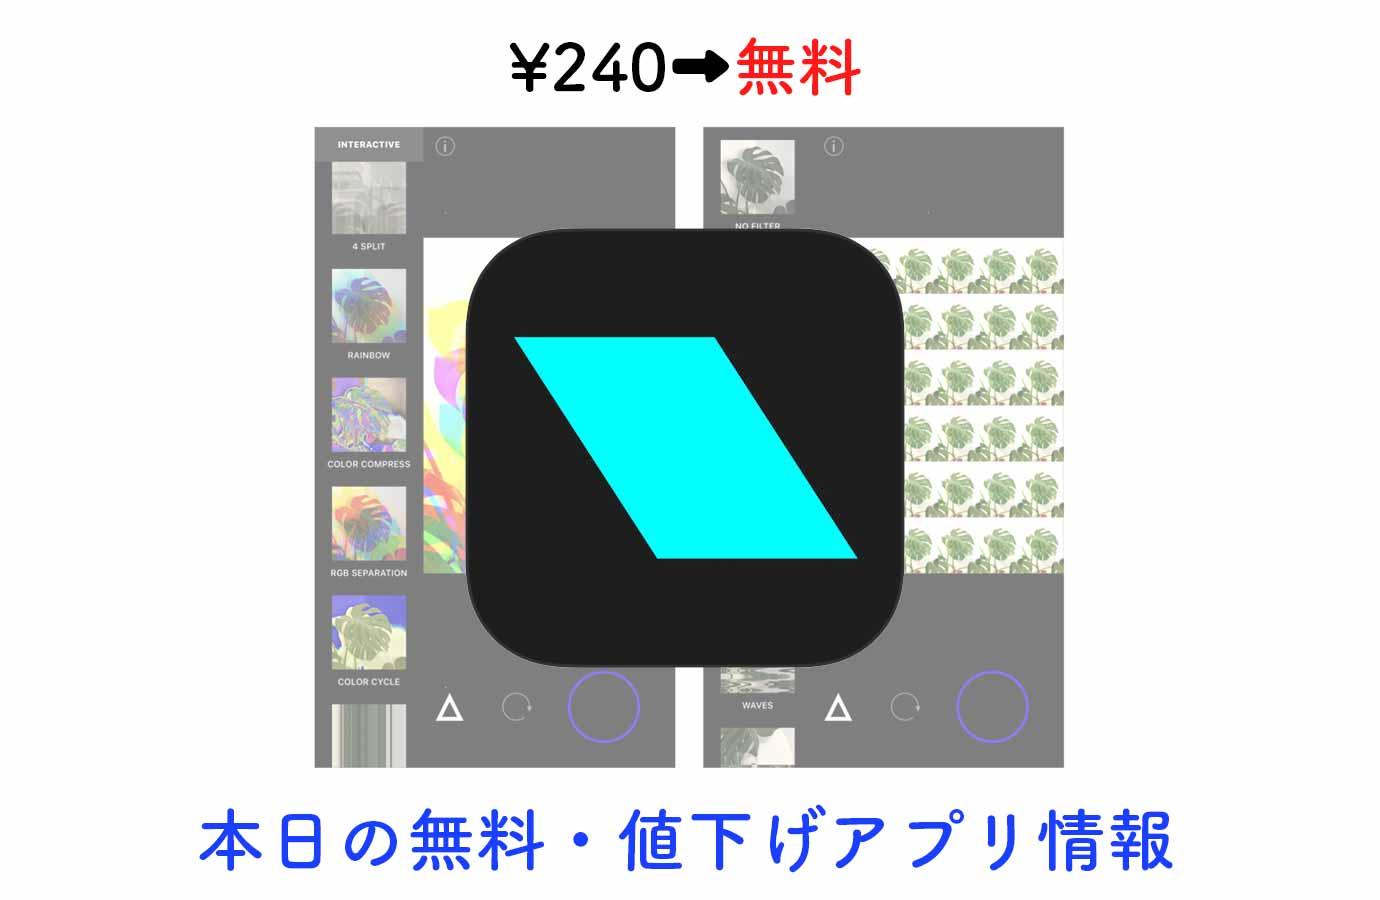 Appsale0803